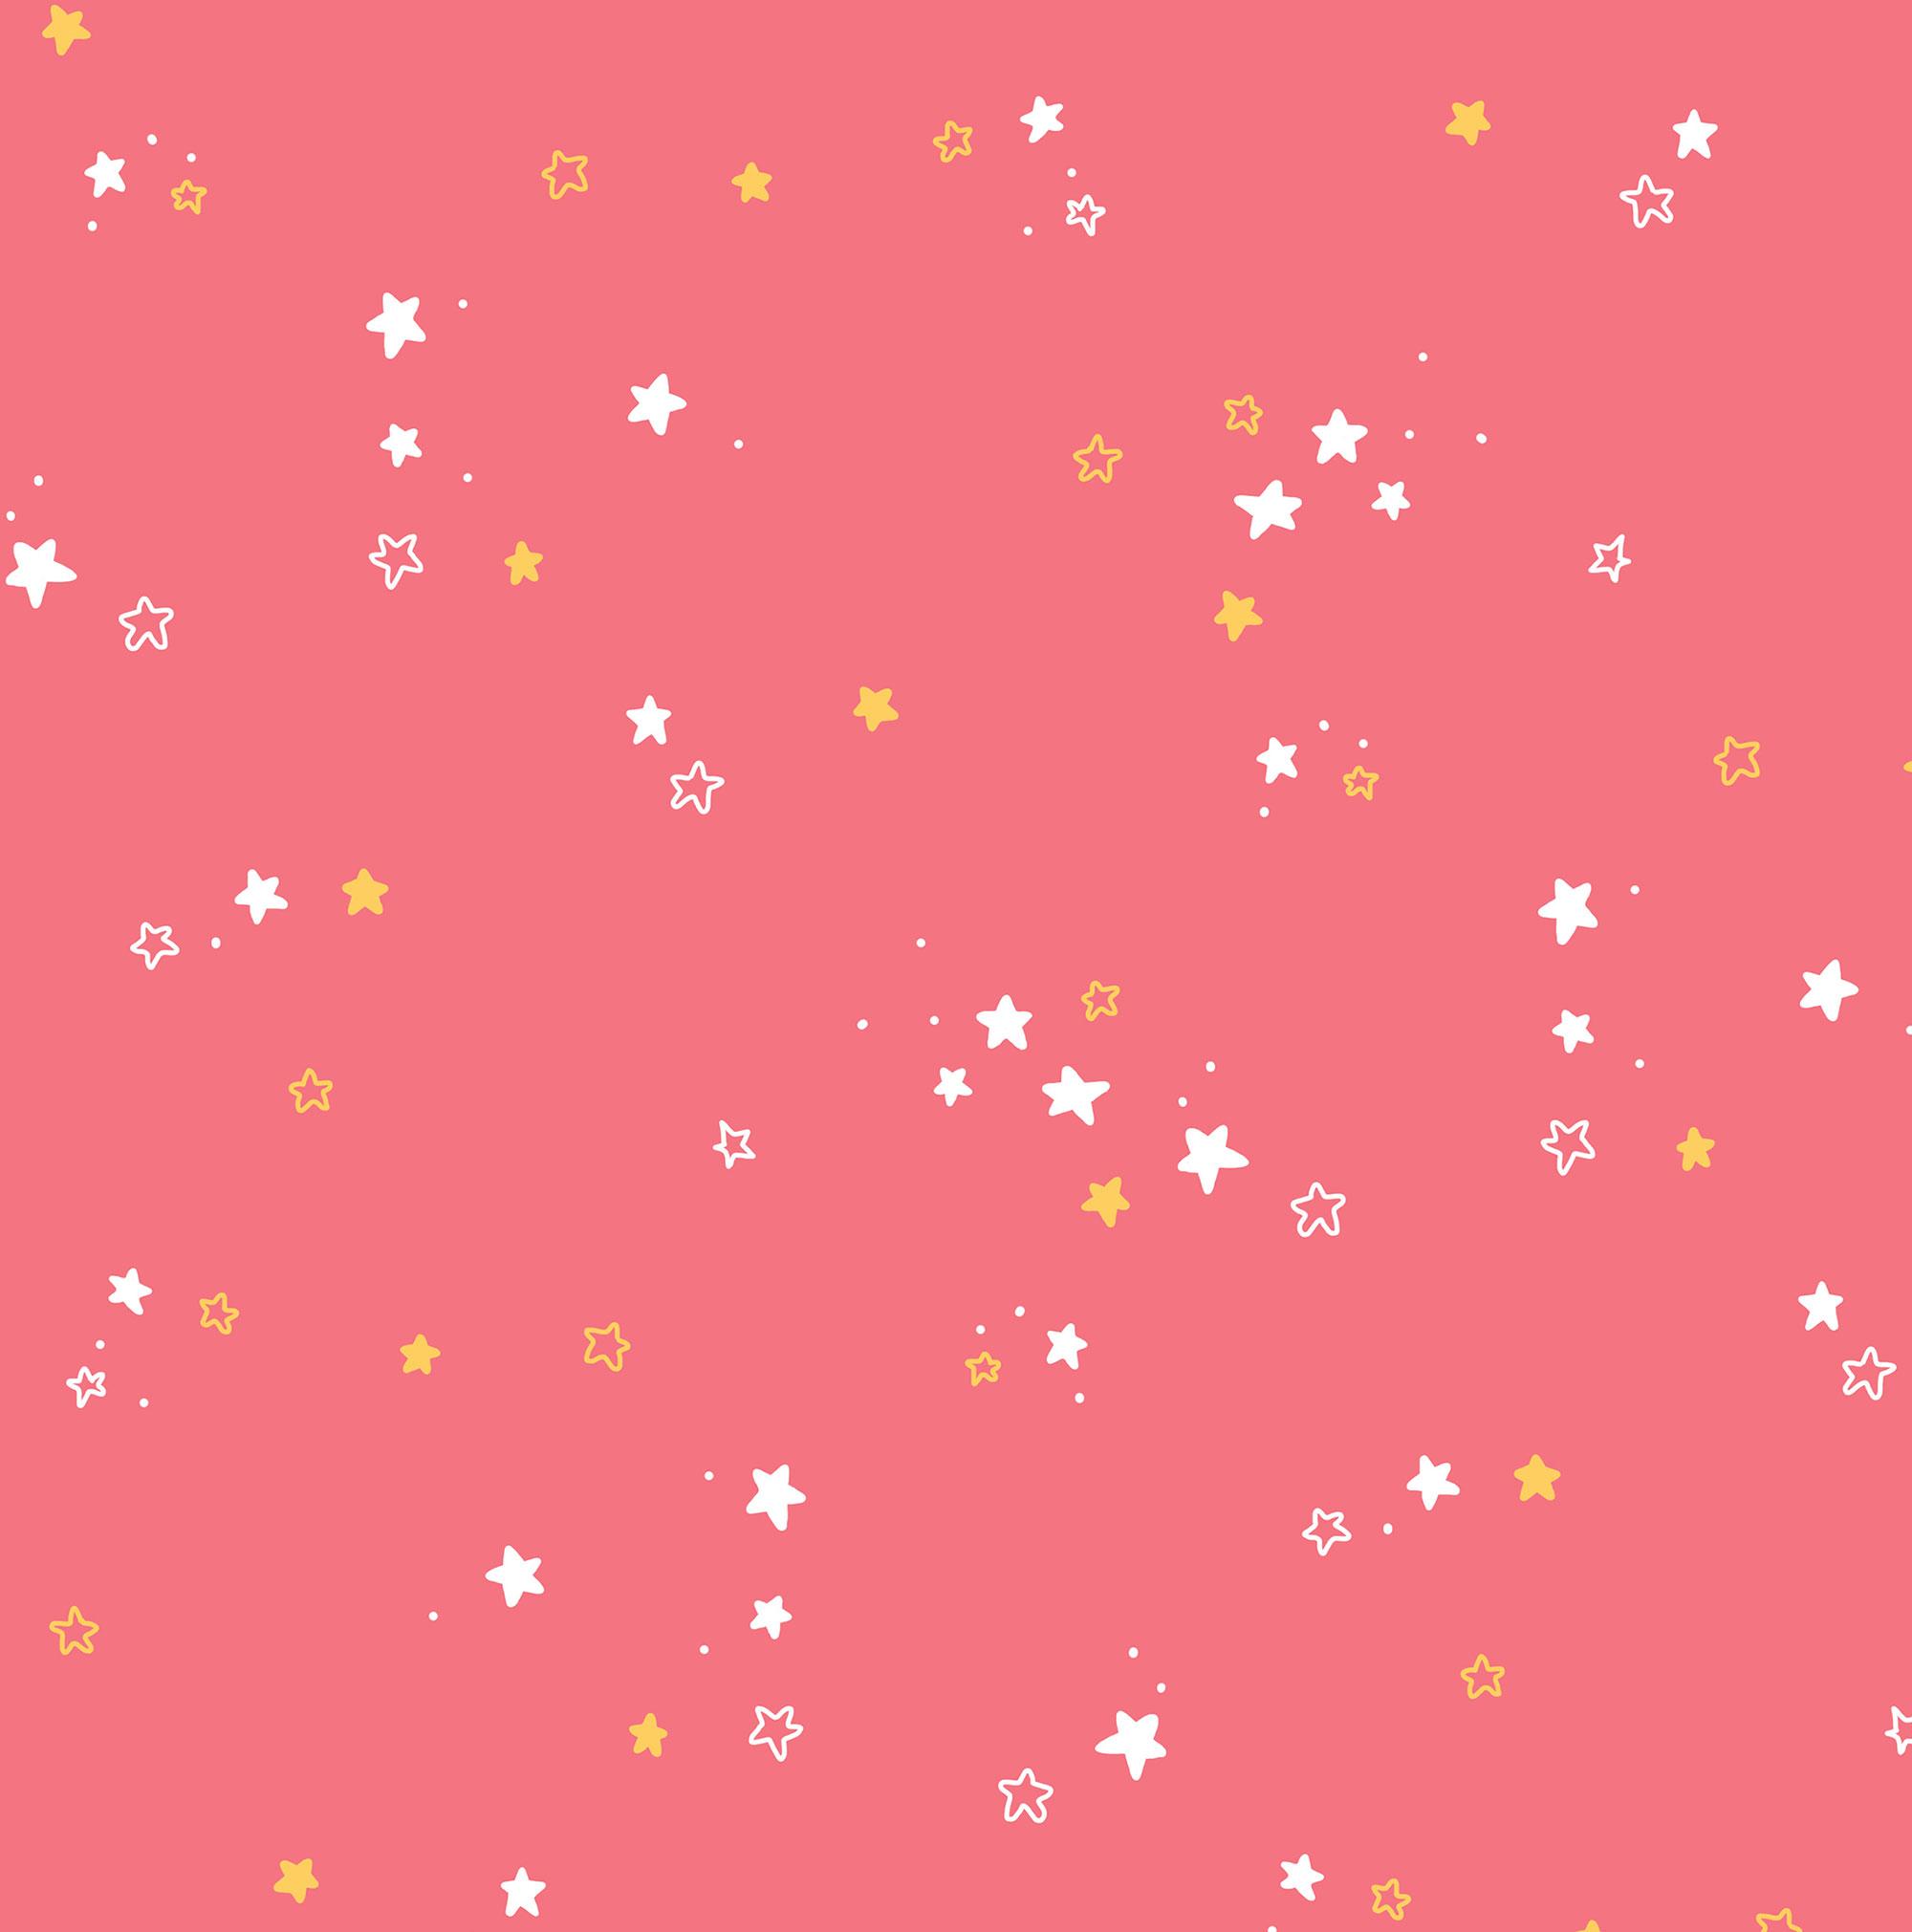 star3web.jpg